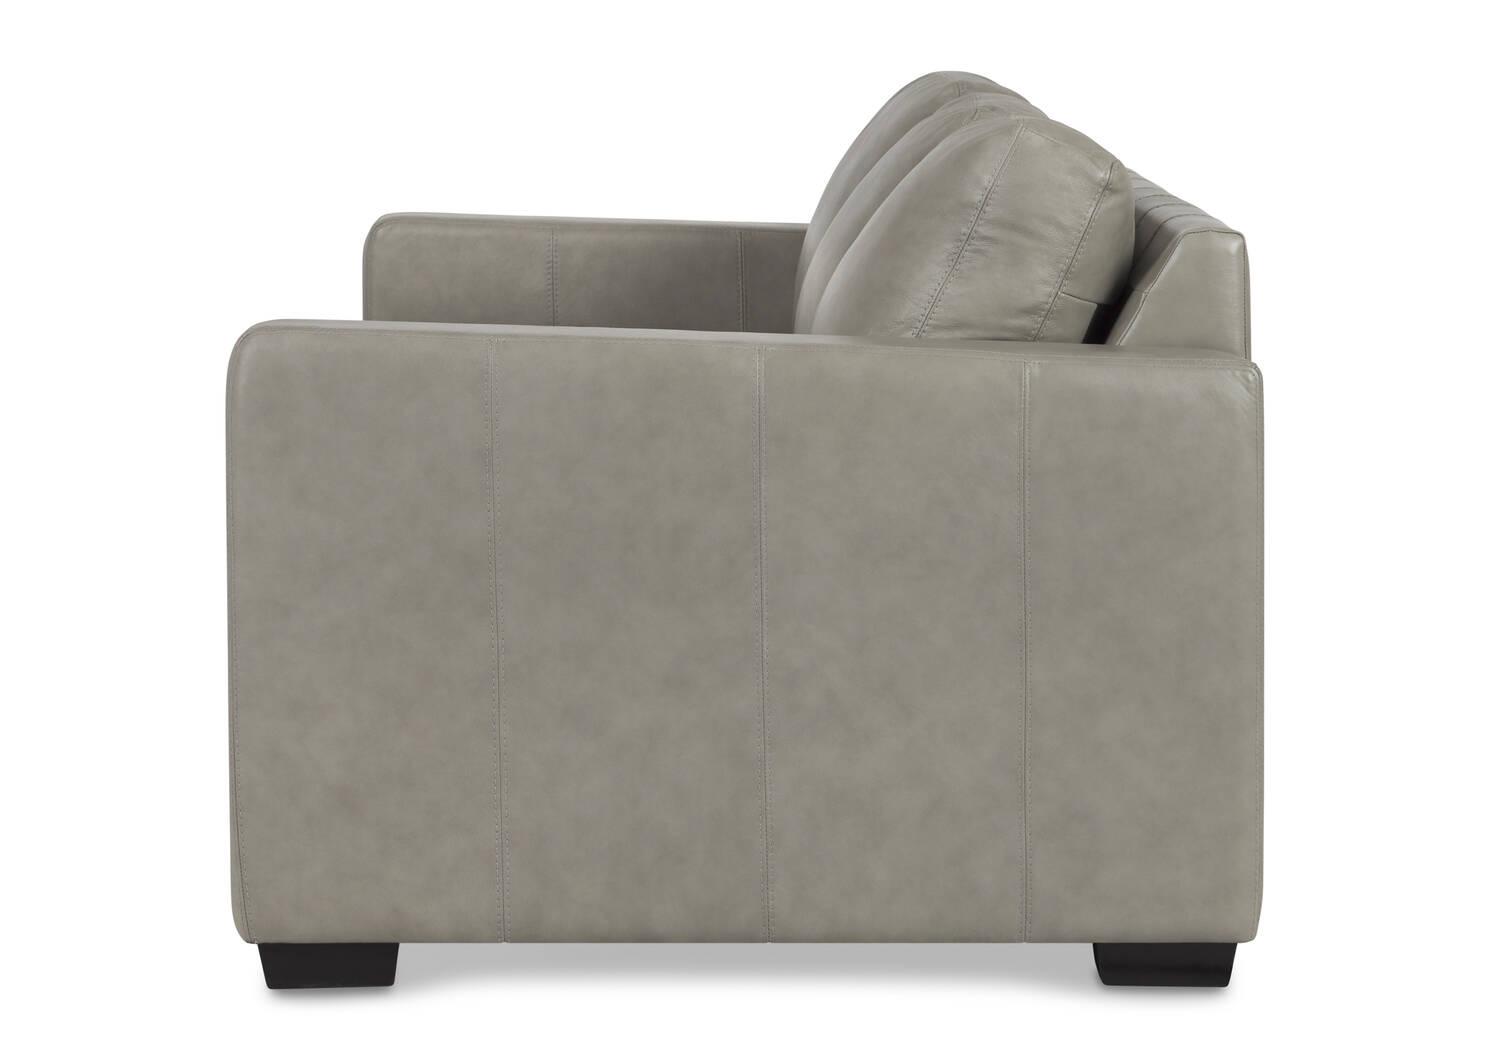 Brewer Custom Leather Sofa